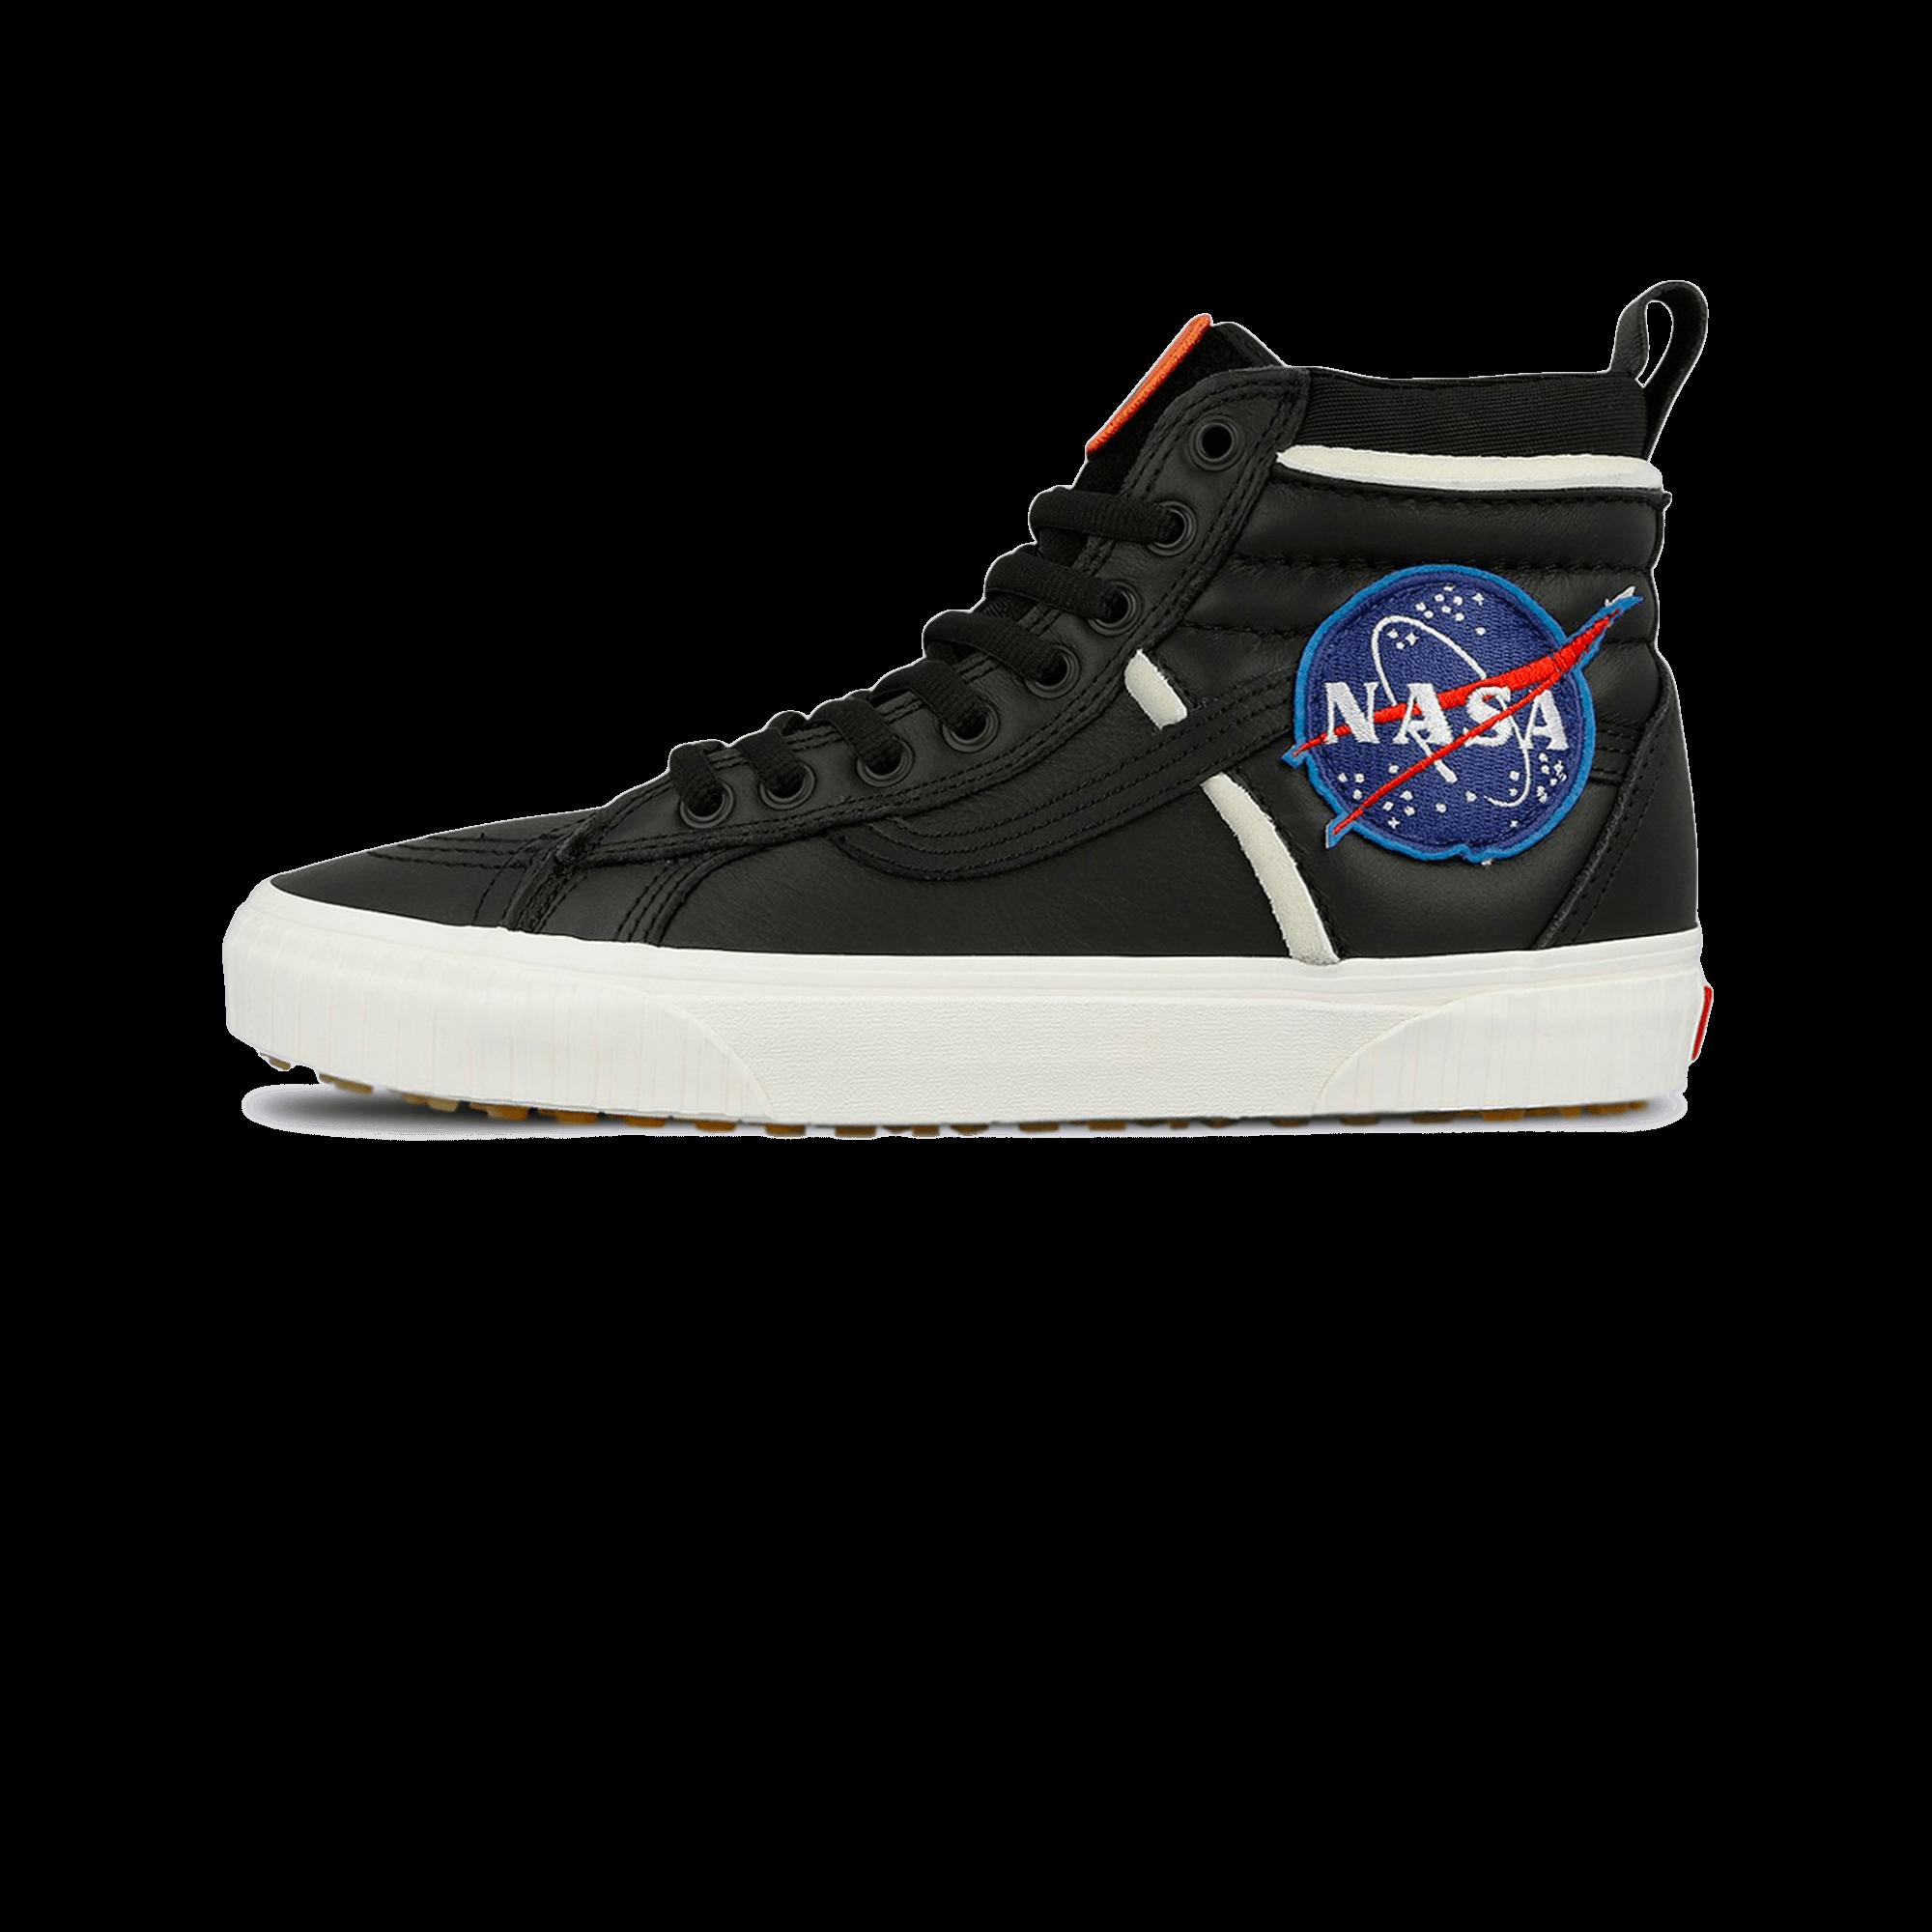 Vans UA SK8 Hi 46 MTE DX x NASA space voyager black Uomo |